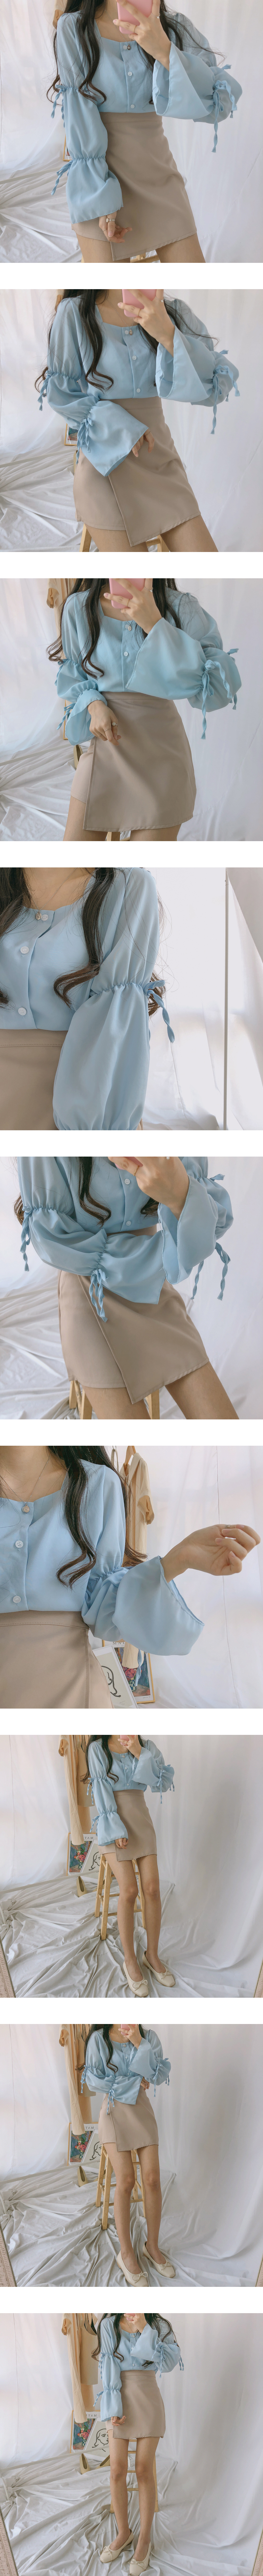 Daily undress skirt pants